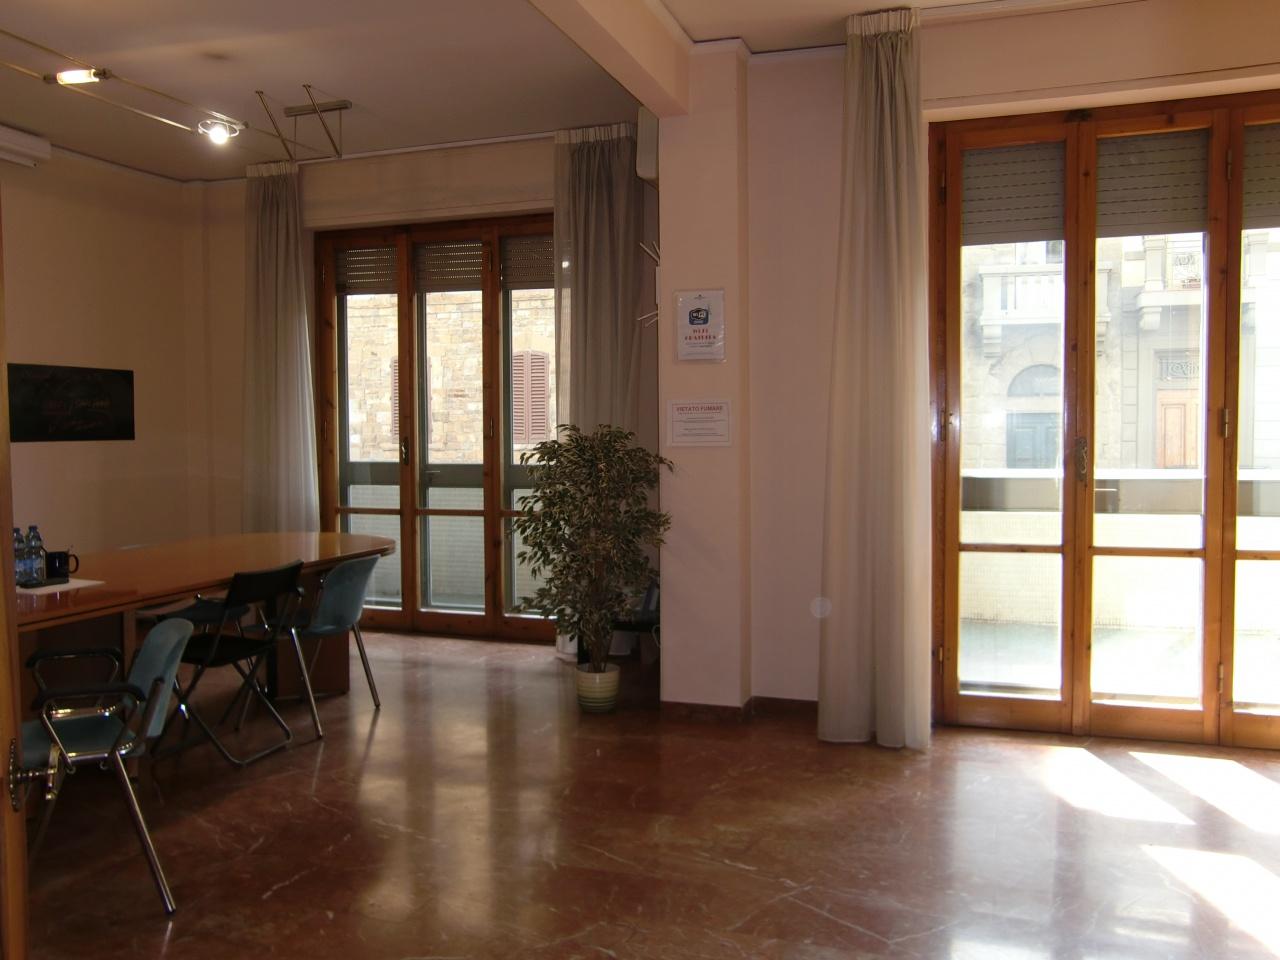 Appartamento FIRENZE vendita  VITTORIO EMANUELE Via Crispi STUDIO IMMOBILIARE FLORENZI DI GIACOMO BIANCHI